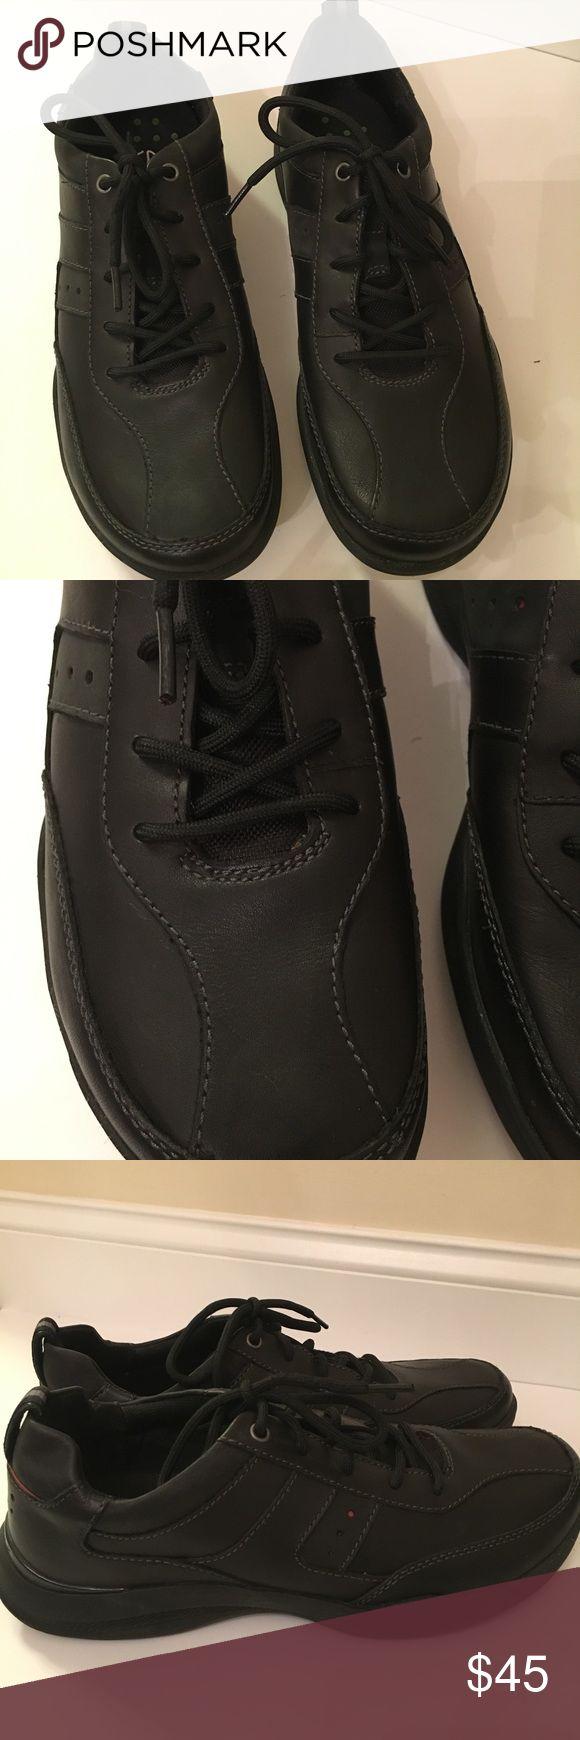 Men's Clarks Black Clark's Wave Walk Shoe, size 10.5, NWOT-worn once Clarks Shoes